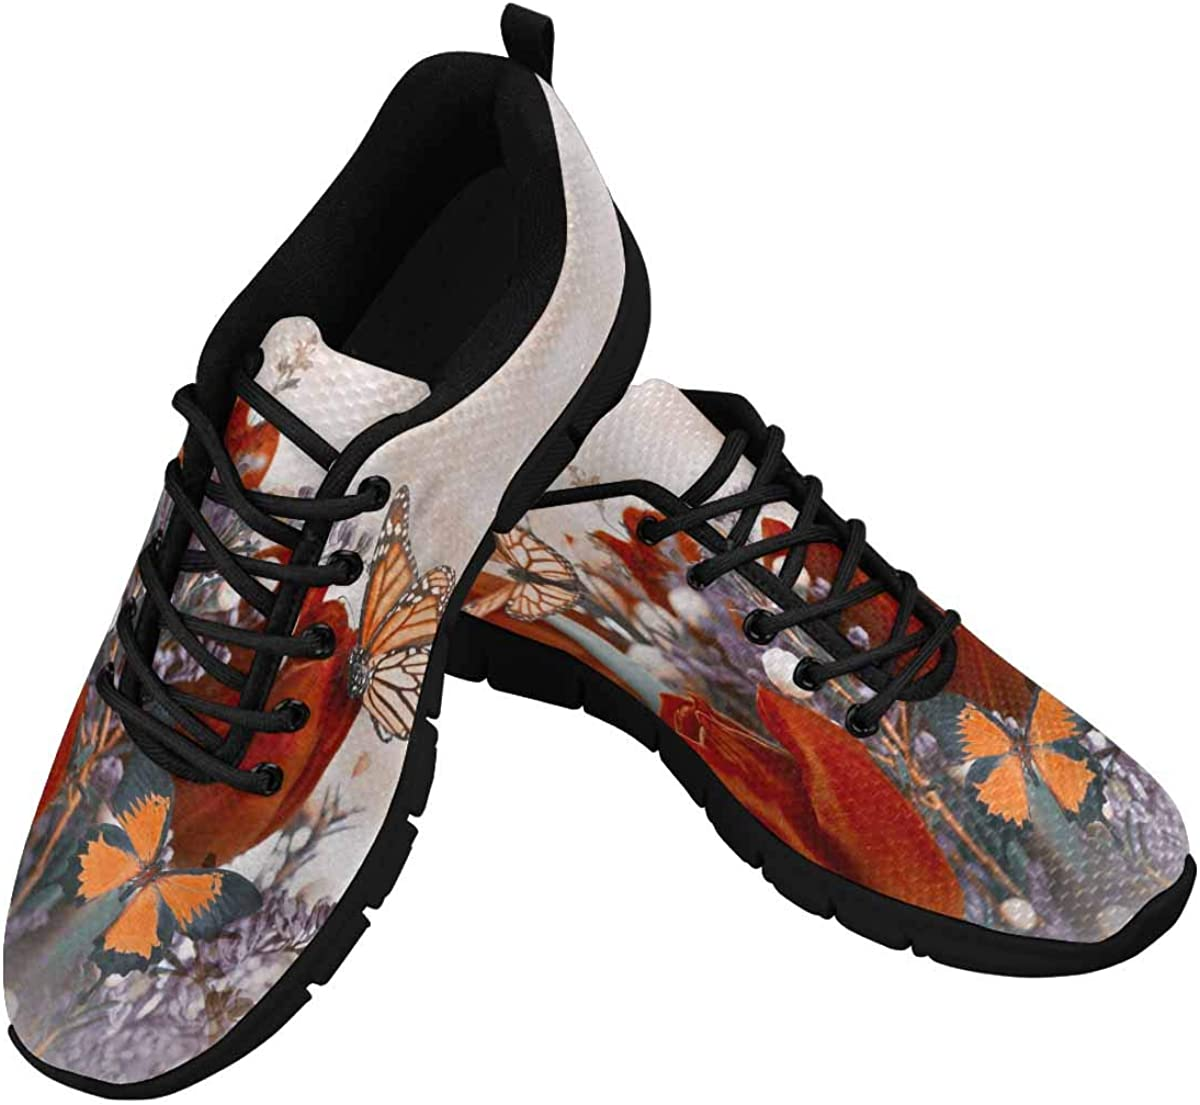 INTERESTPRINT Blue Tulips Mimosa Butterfly Women's Walking Shoes Lightweight Casual Running Sneakers